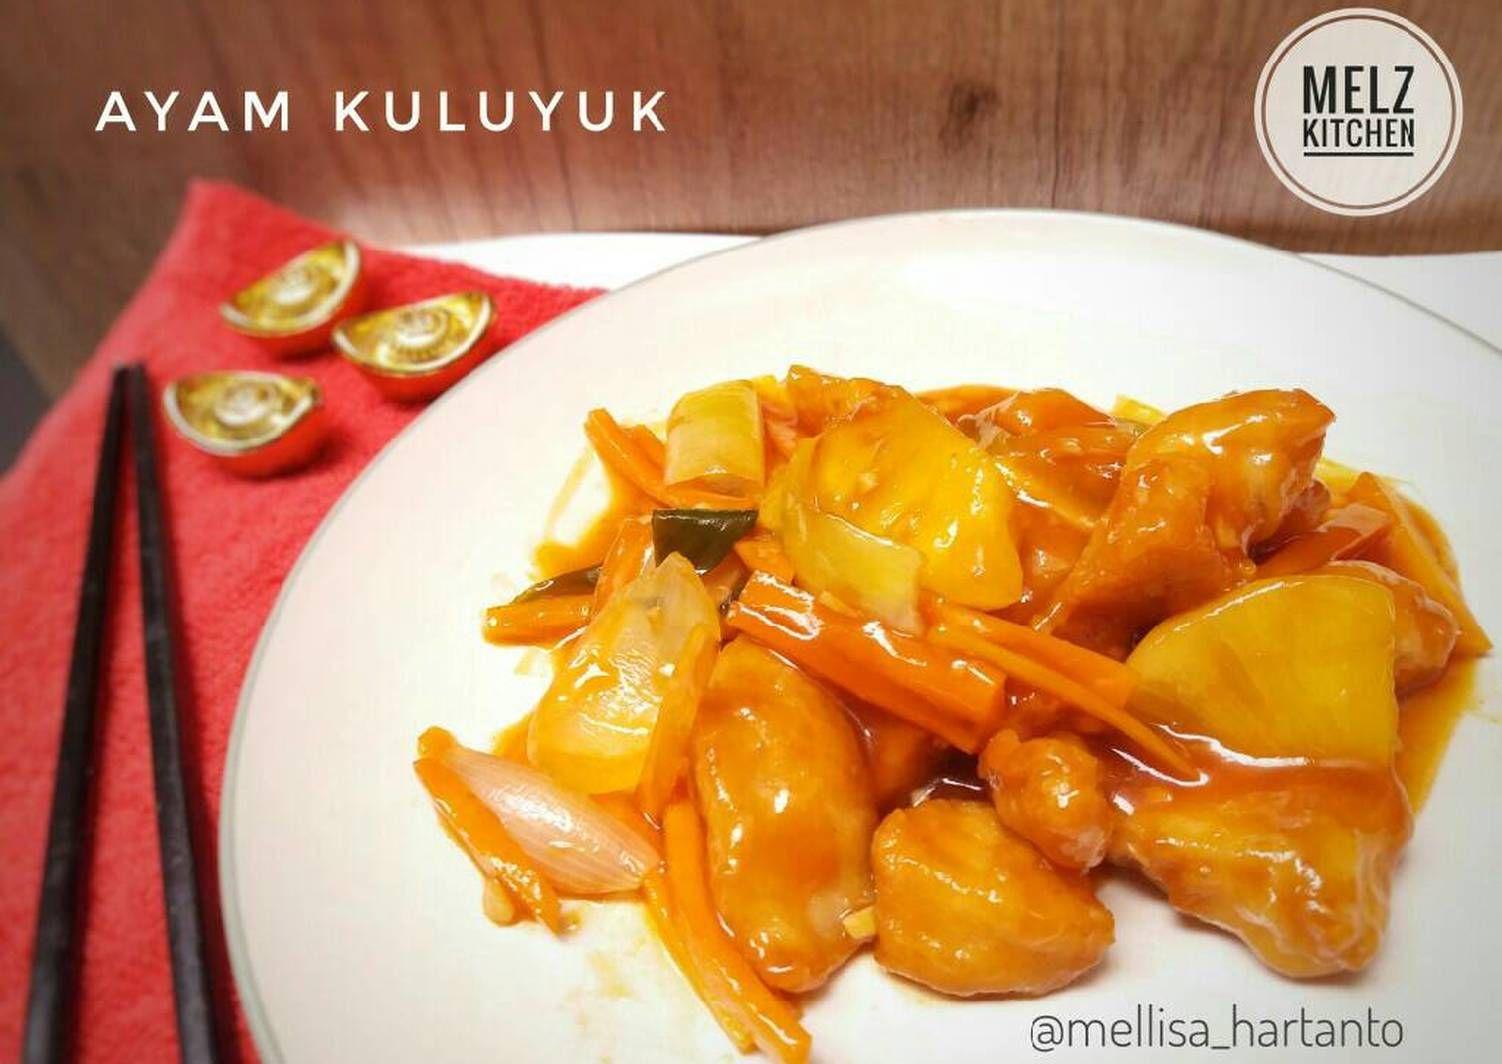 Resep Ayam Kuluyuk Warisan Nenek Oleh Melz Kitchen Resep Resep Ayam Resep Masakan Indonesia Resep Masakan